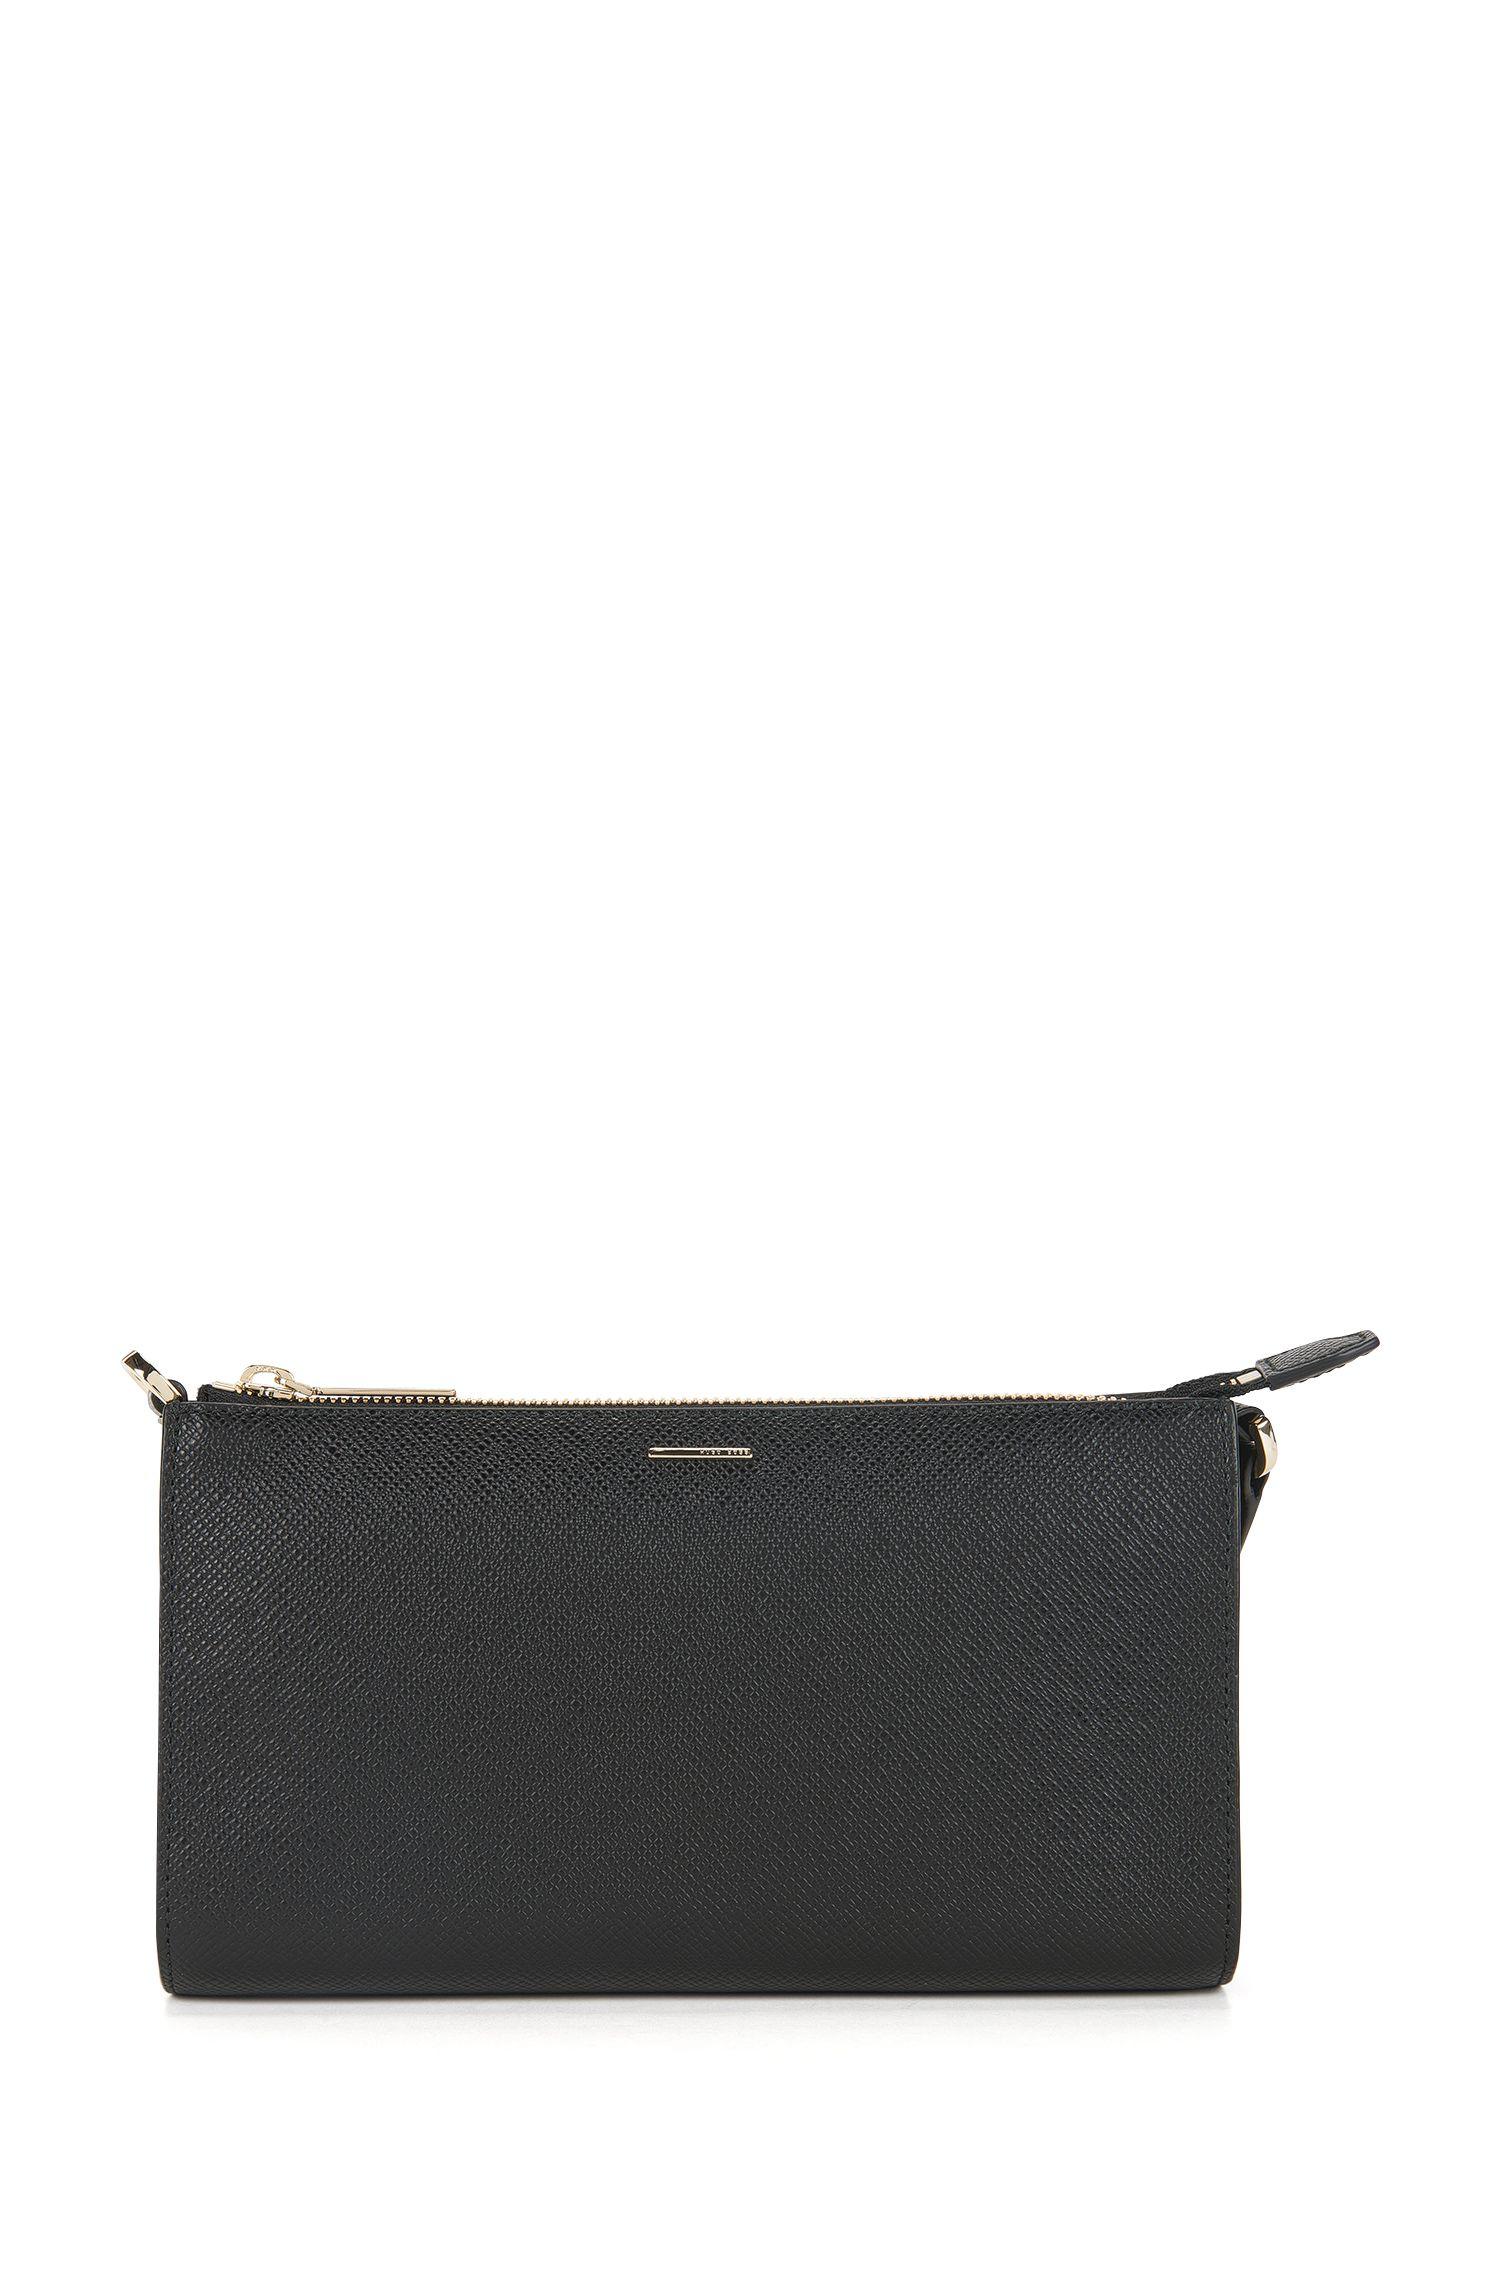 Calfskin Embossed Clutch | Staple Mini Bag FPB